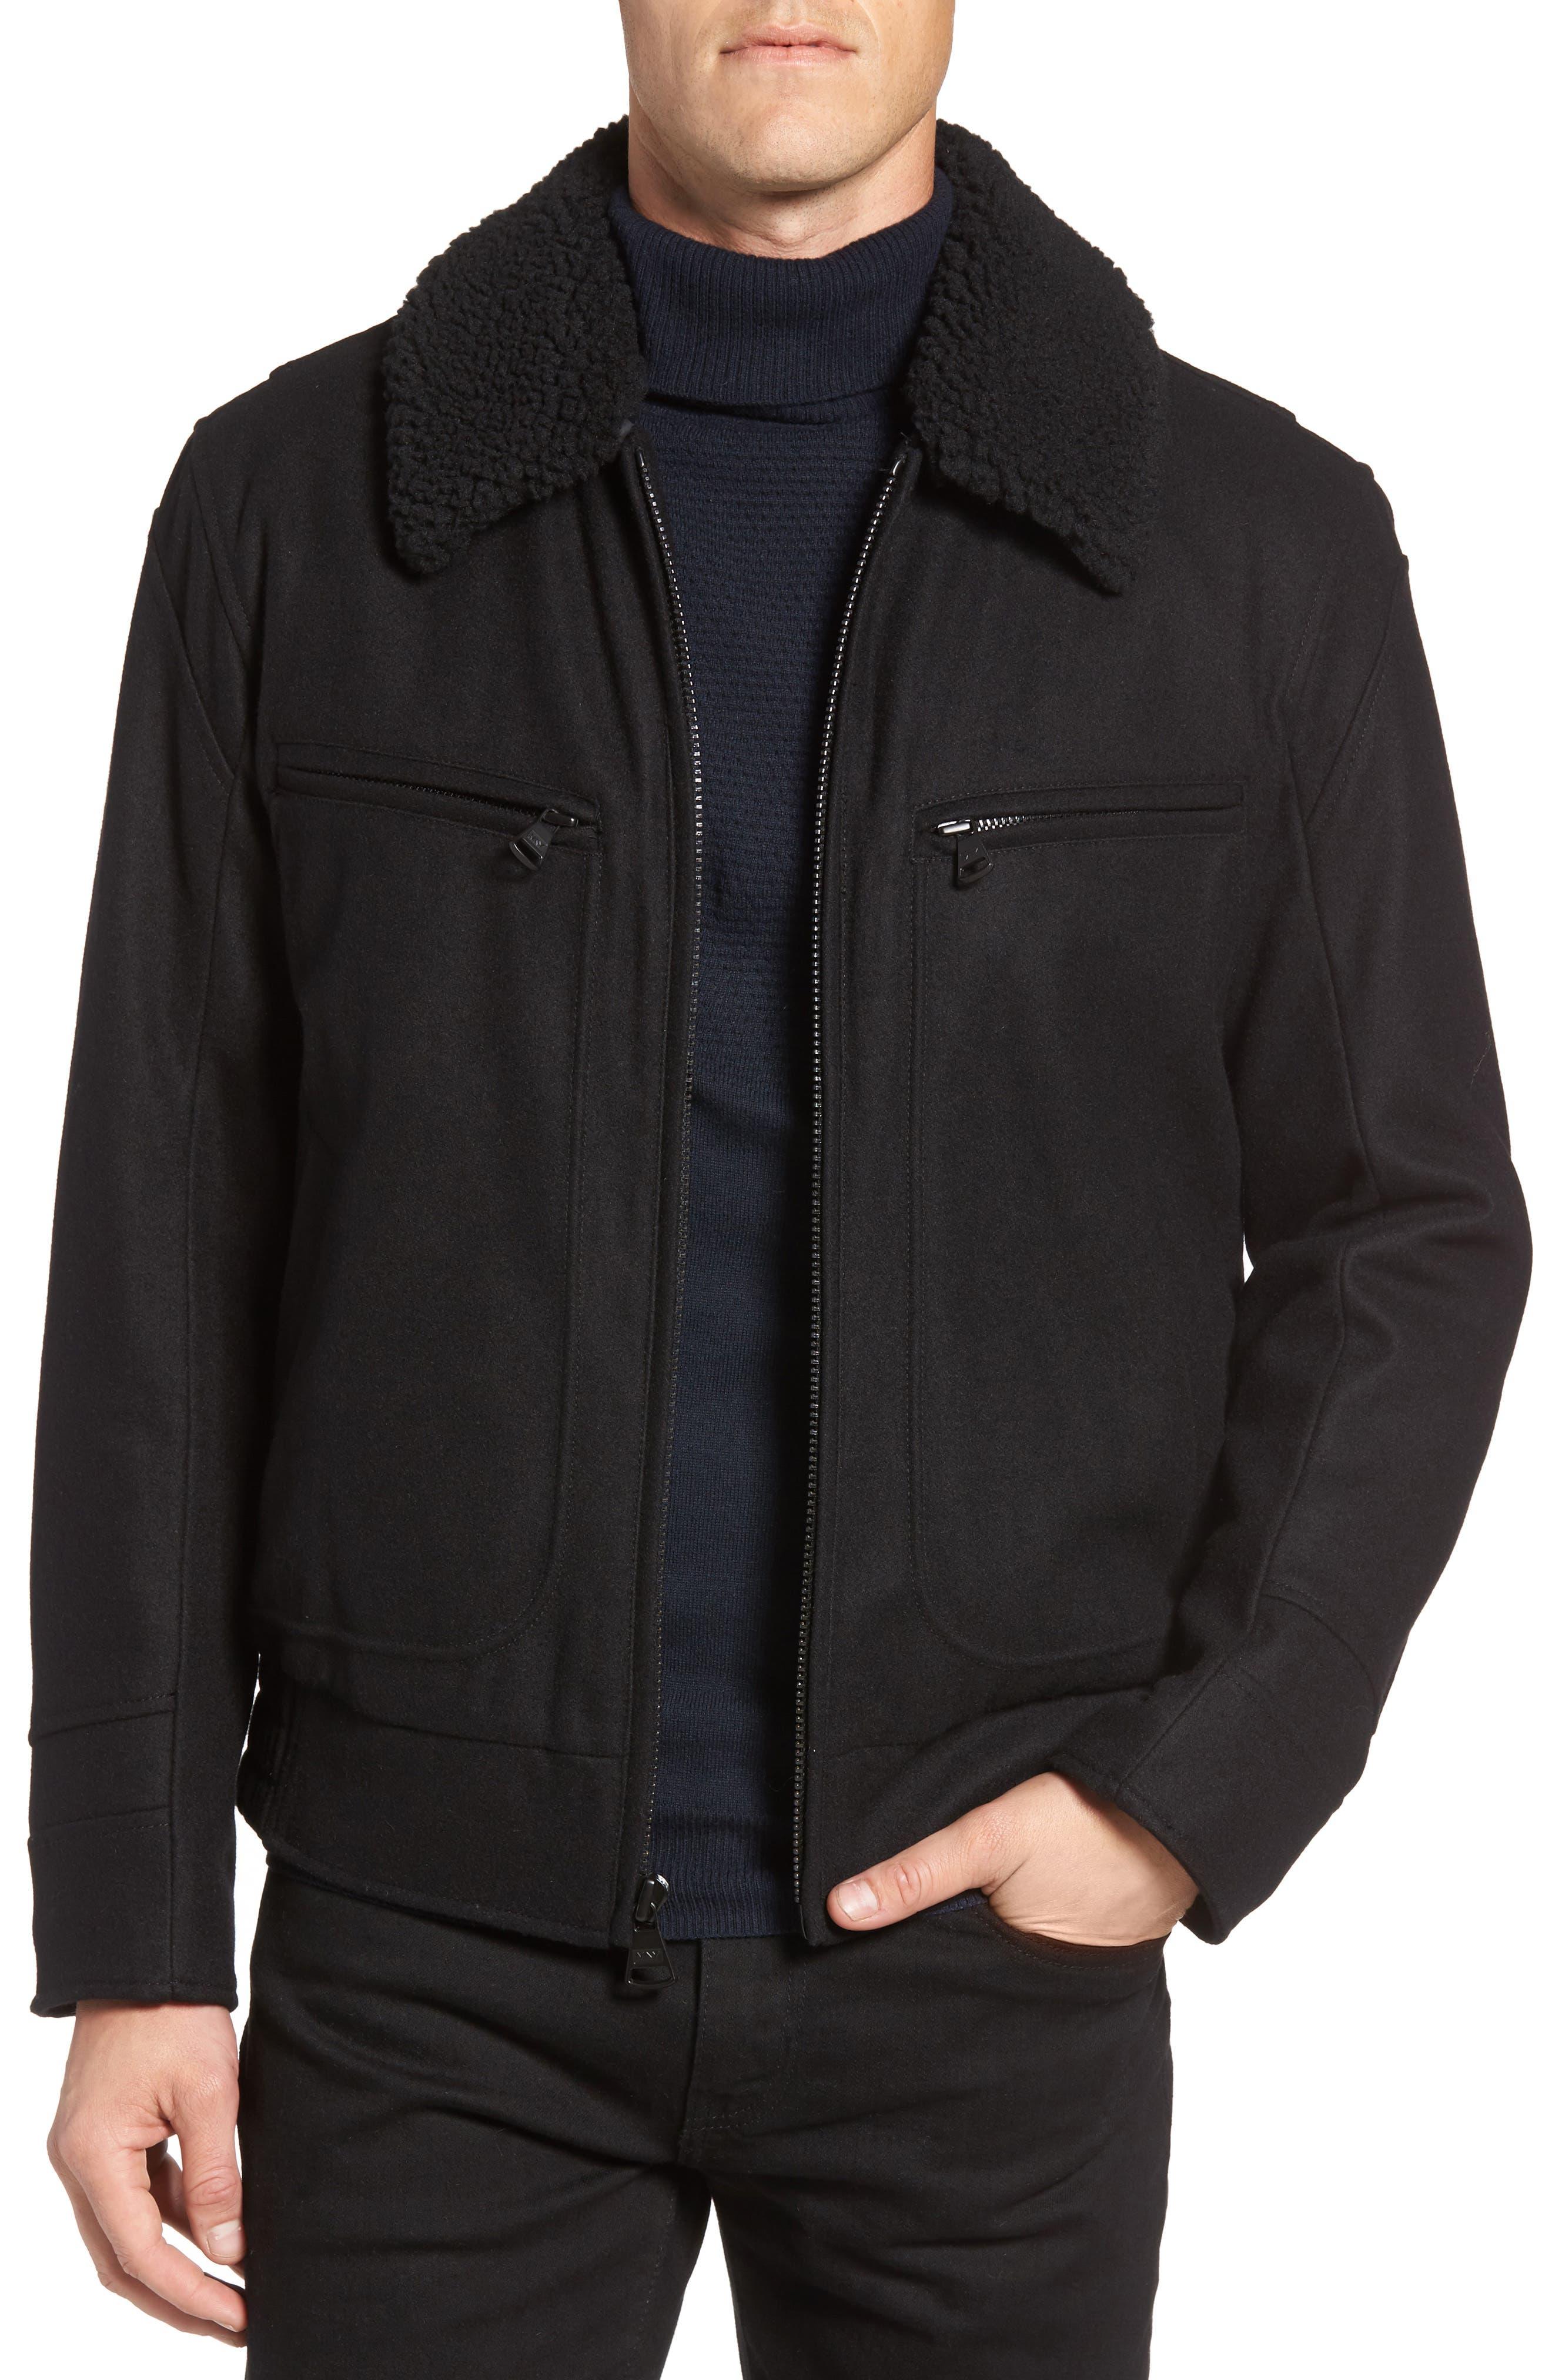 Concord Faux Shearling Aviator Jacket,                             Main thumbnail 1, color,                             Black